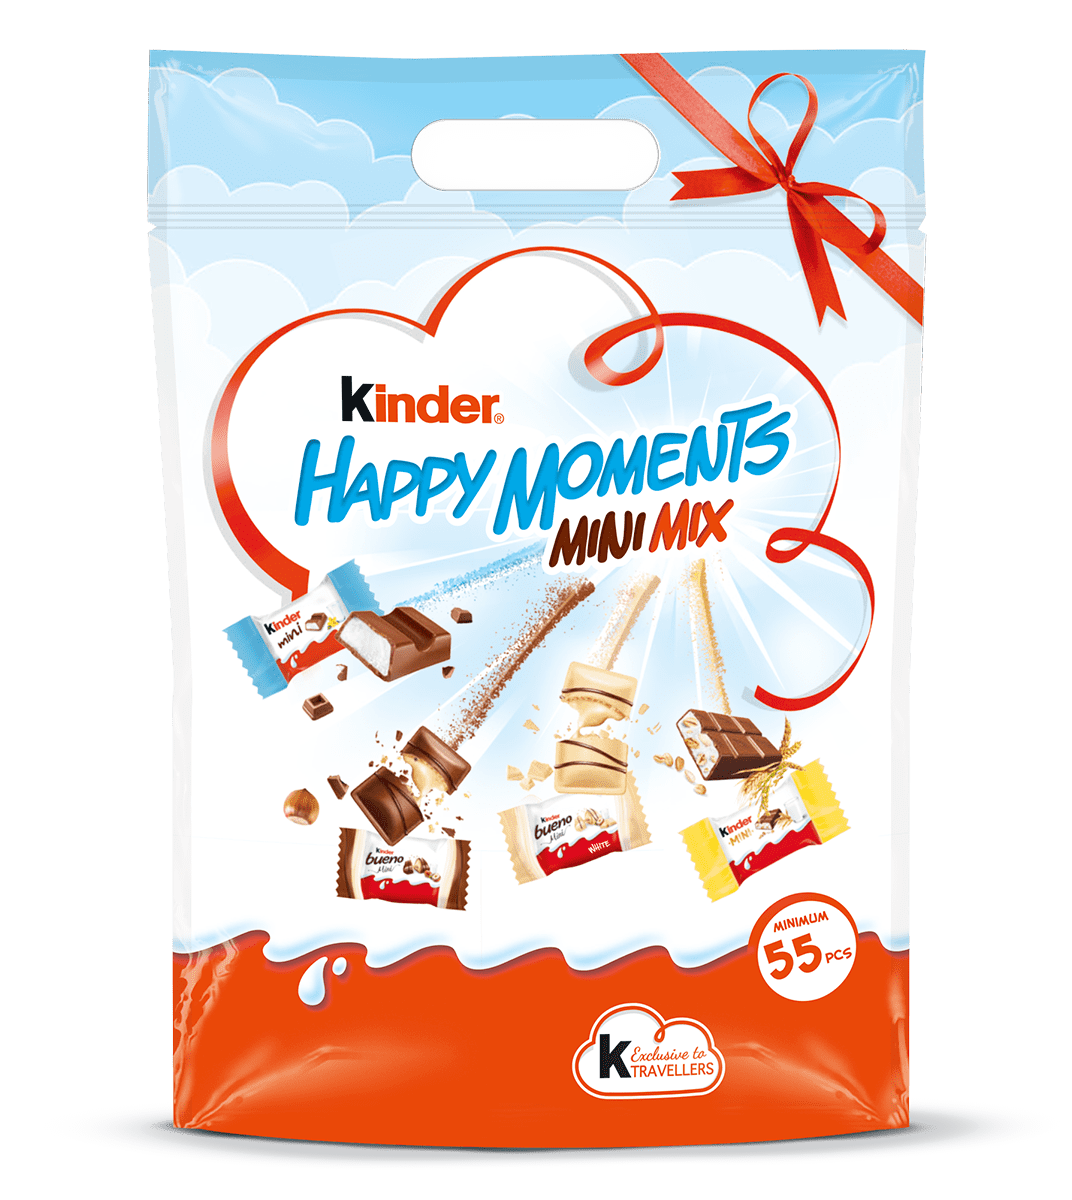 Kinder Happy Moments 338g